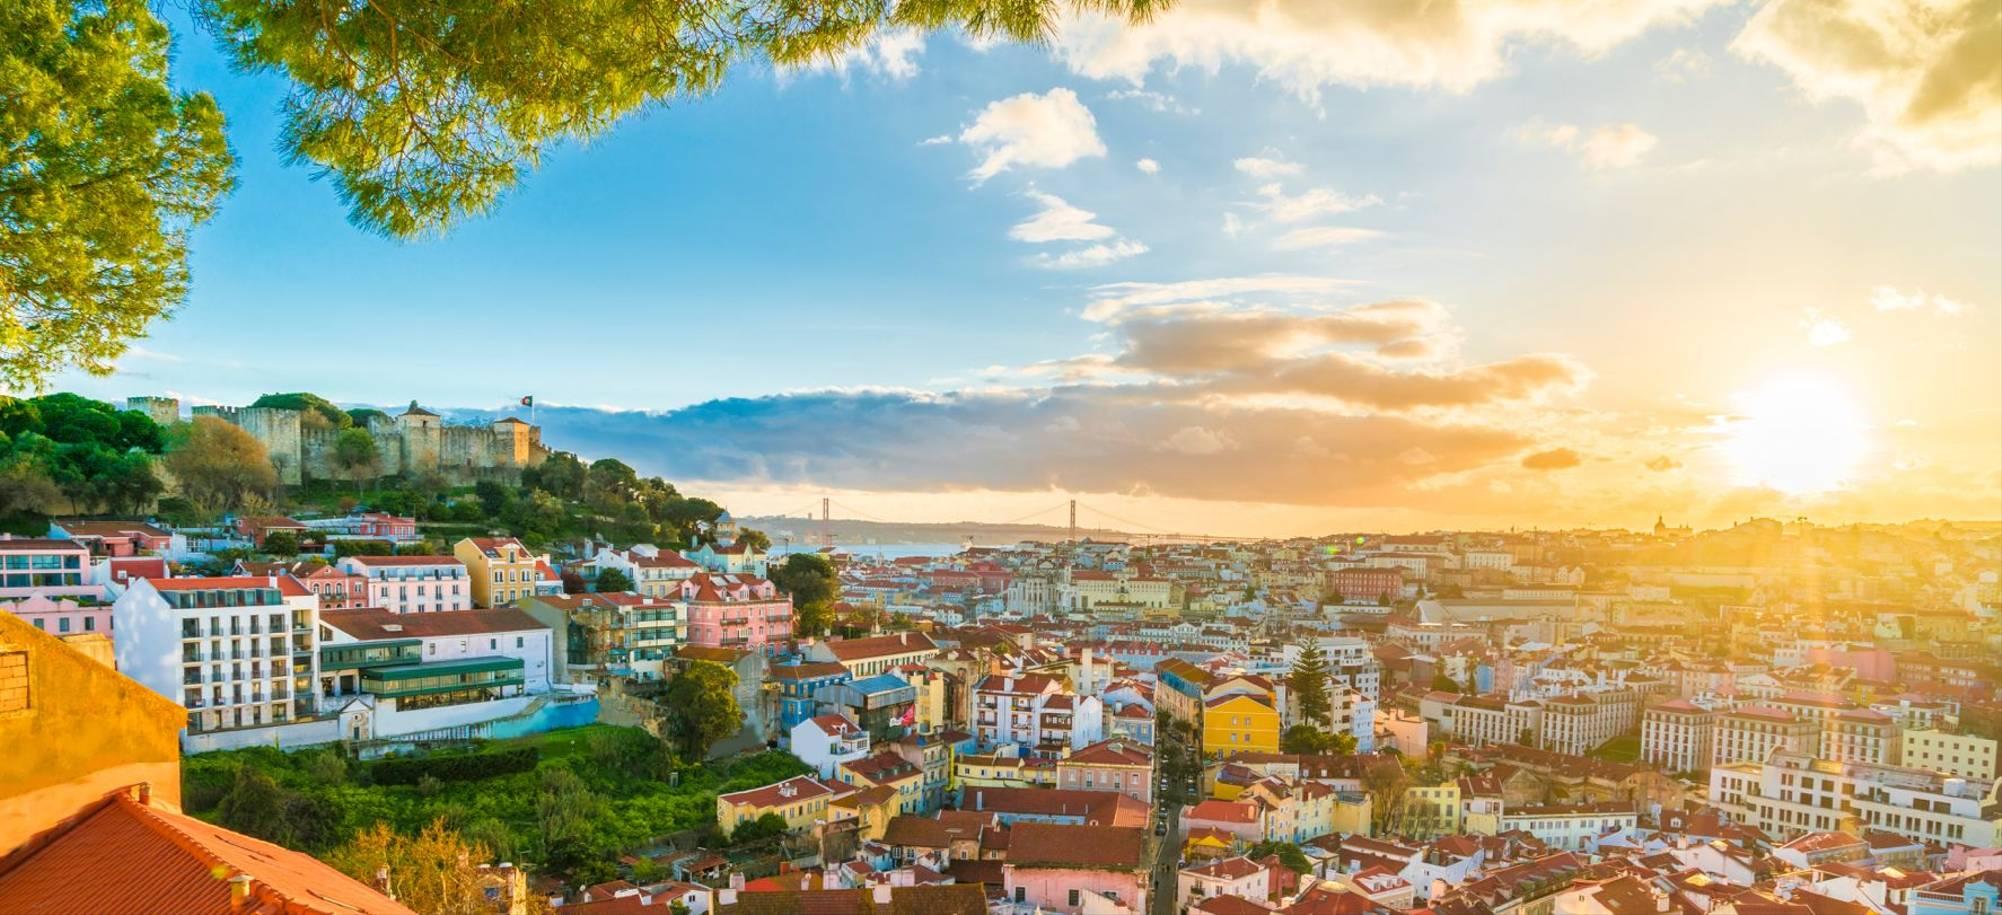 23 Day - Lisbon, Panoramic view - Itinerary Desktop .jpg